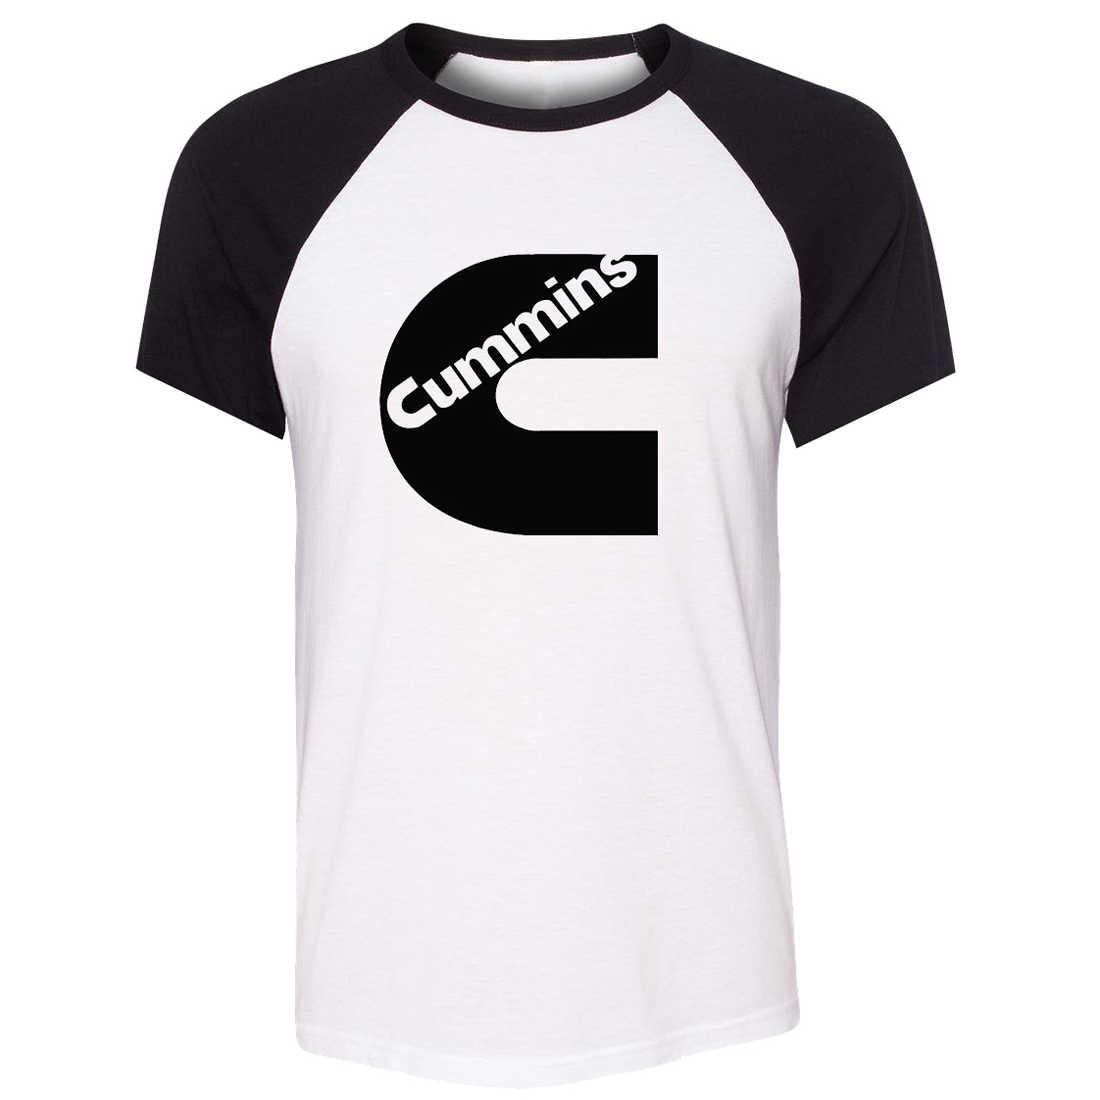 7cf024182 Unisex Summer T-shirt Funny C Cummins Truck Art Pattern Raglan Short Sleeve  Dad and